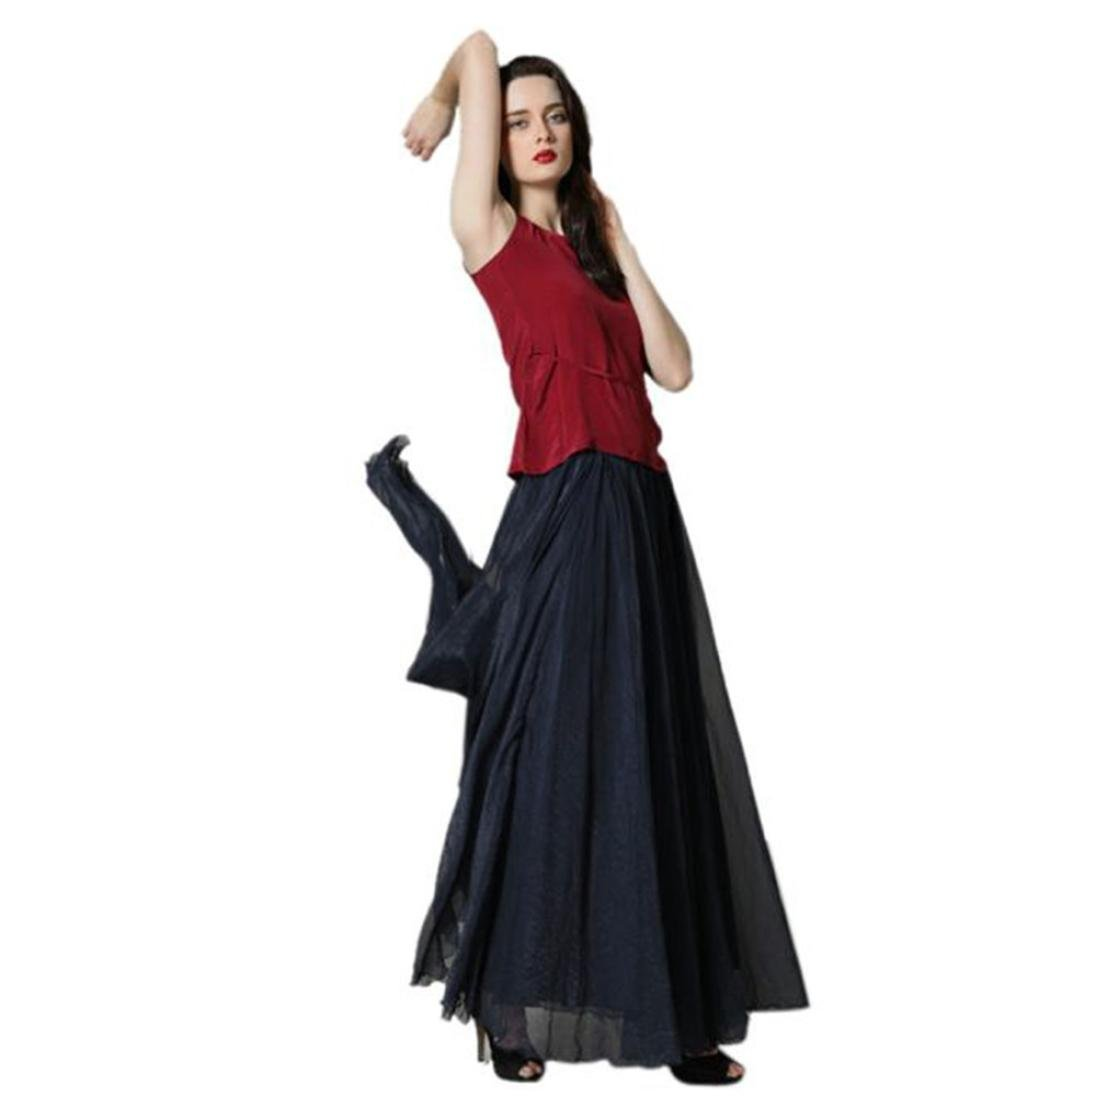 2019 New Women Ladies Long Maxi Tulle Skirt Vintage Polka Dot Rockabilly Tutu Skirts Solid Black White Maxi Lace Ruffle Skirt Terrific Value Bottoms